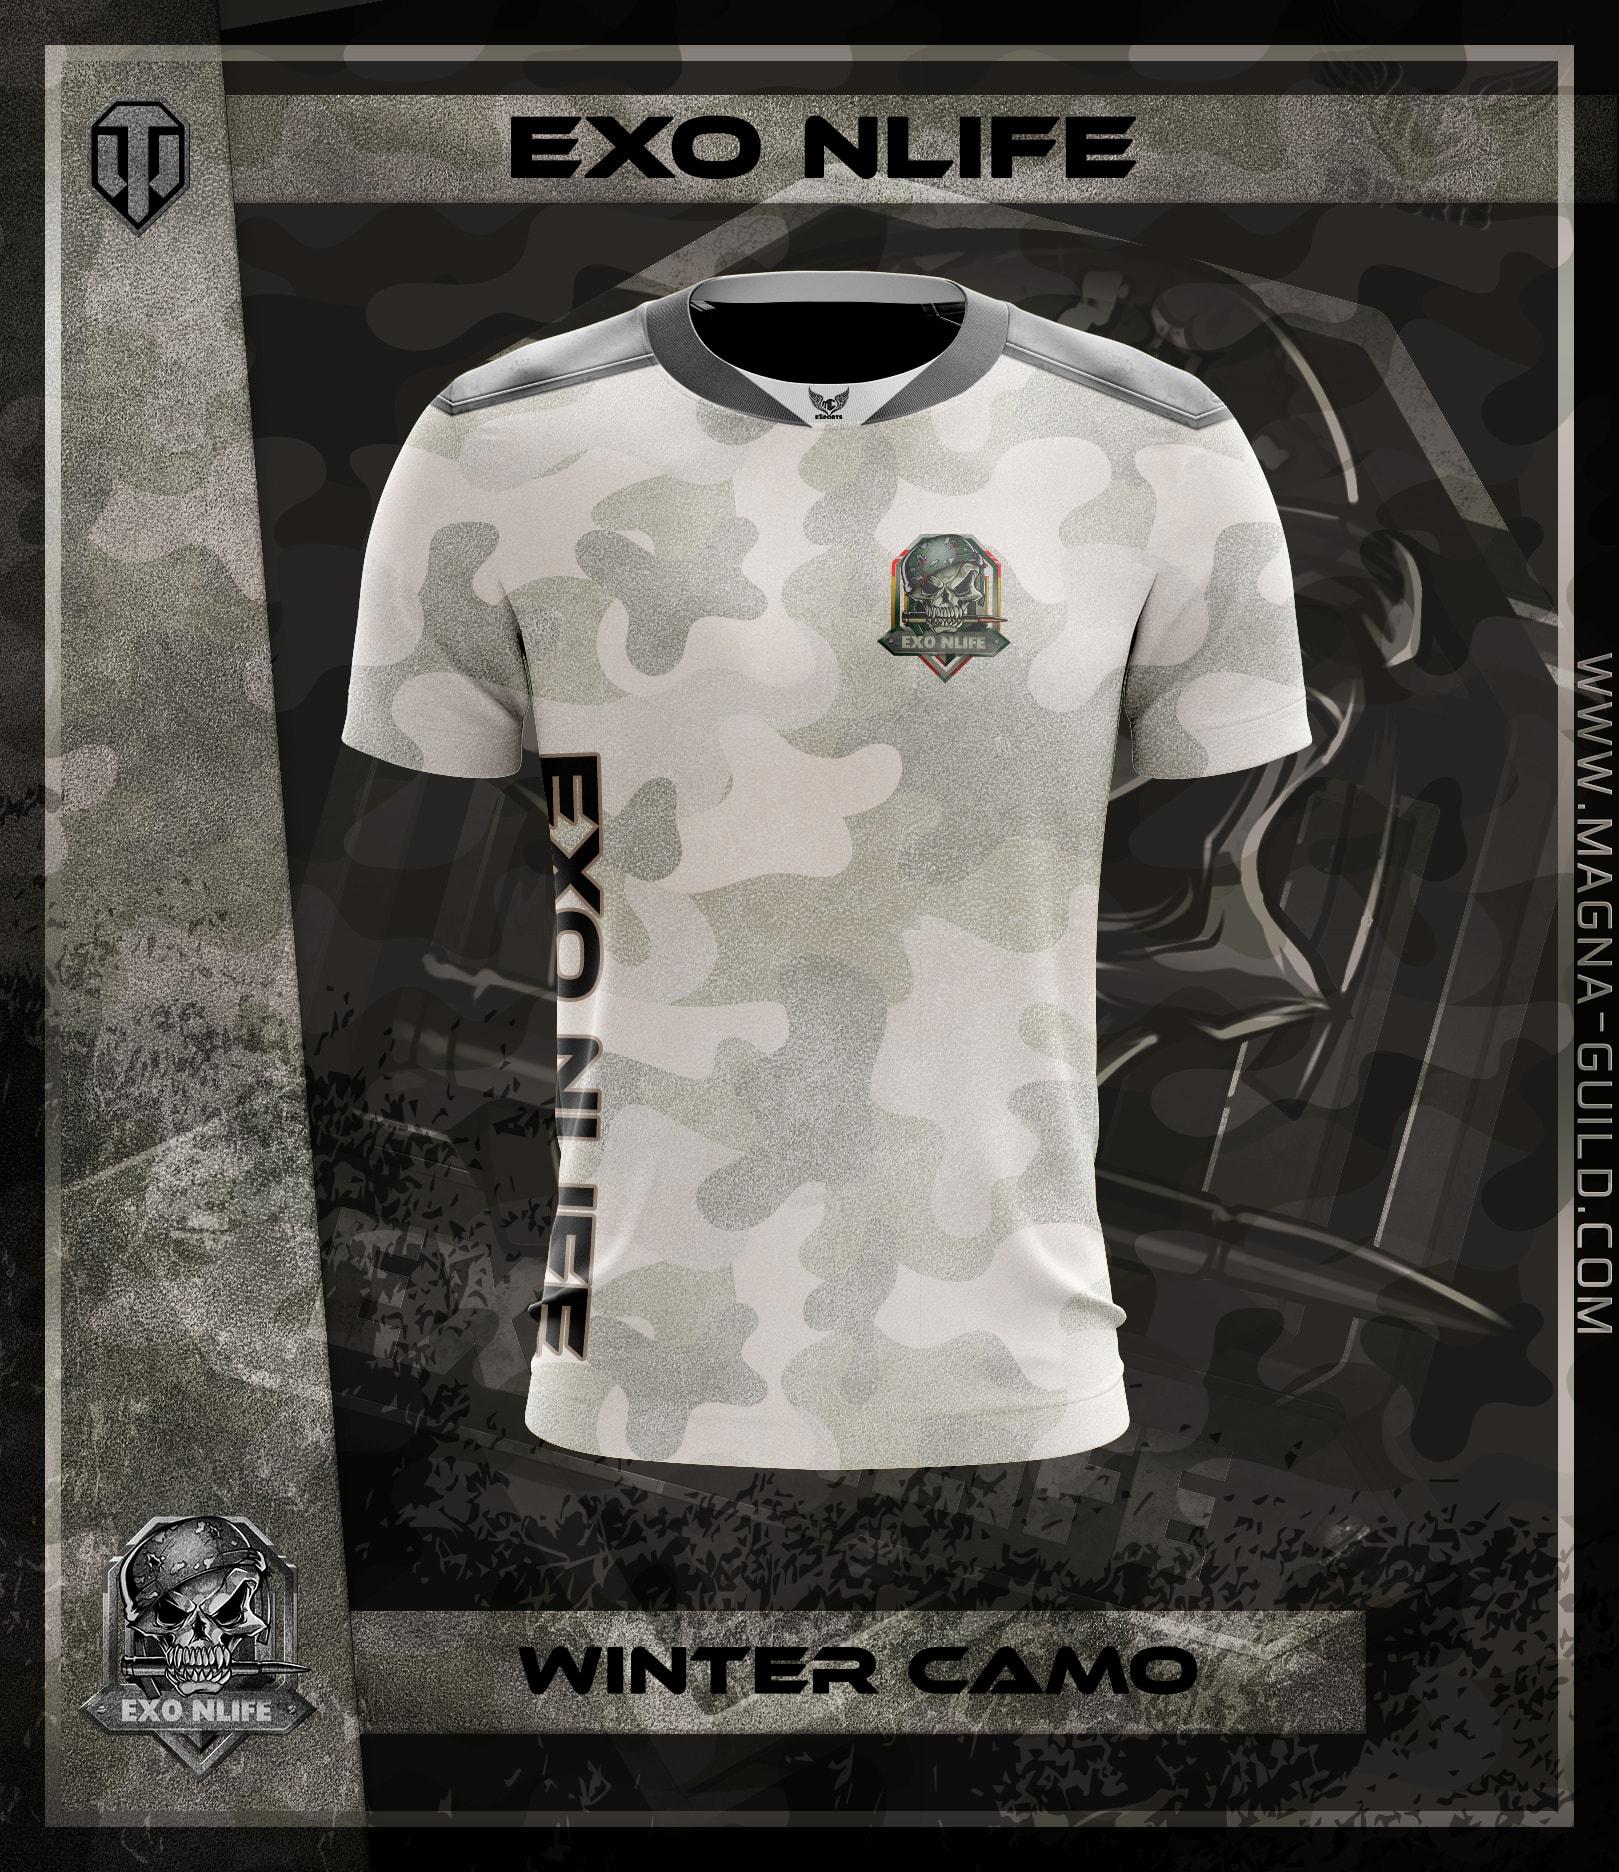 Winter Camo